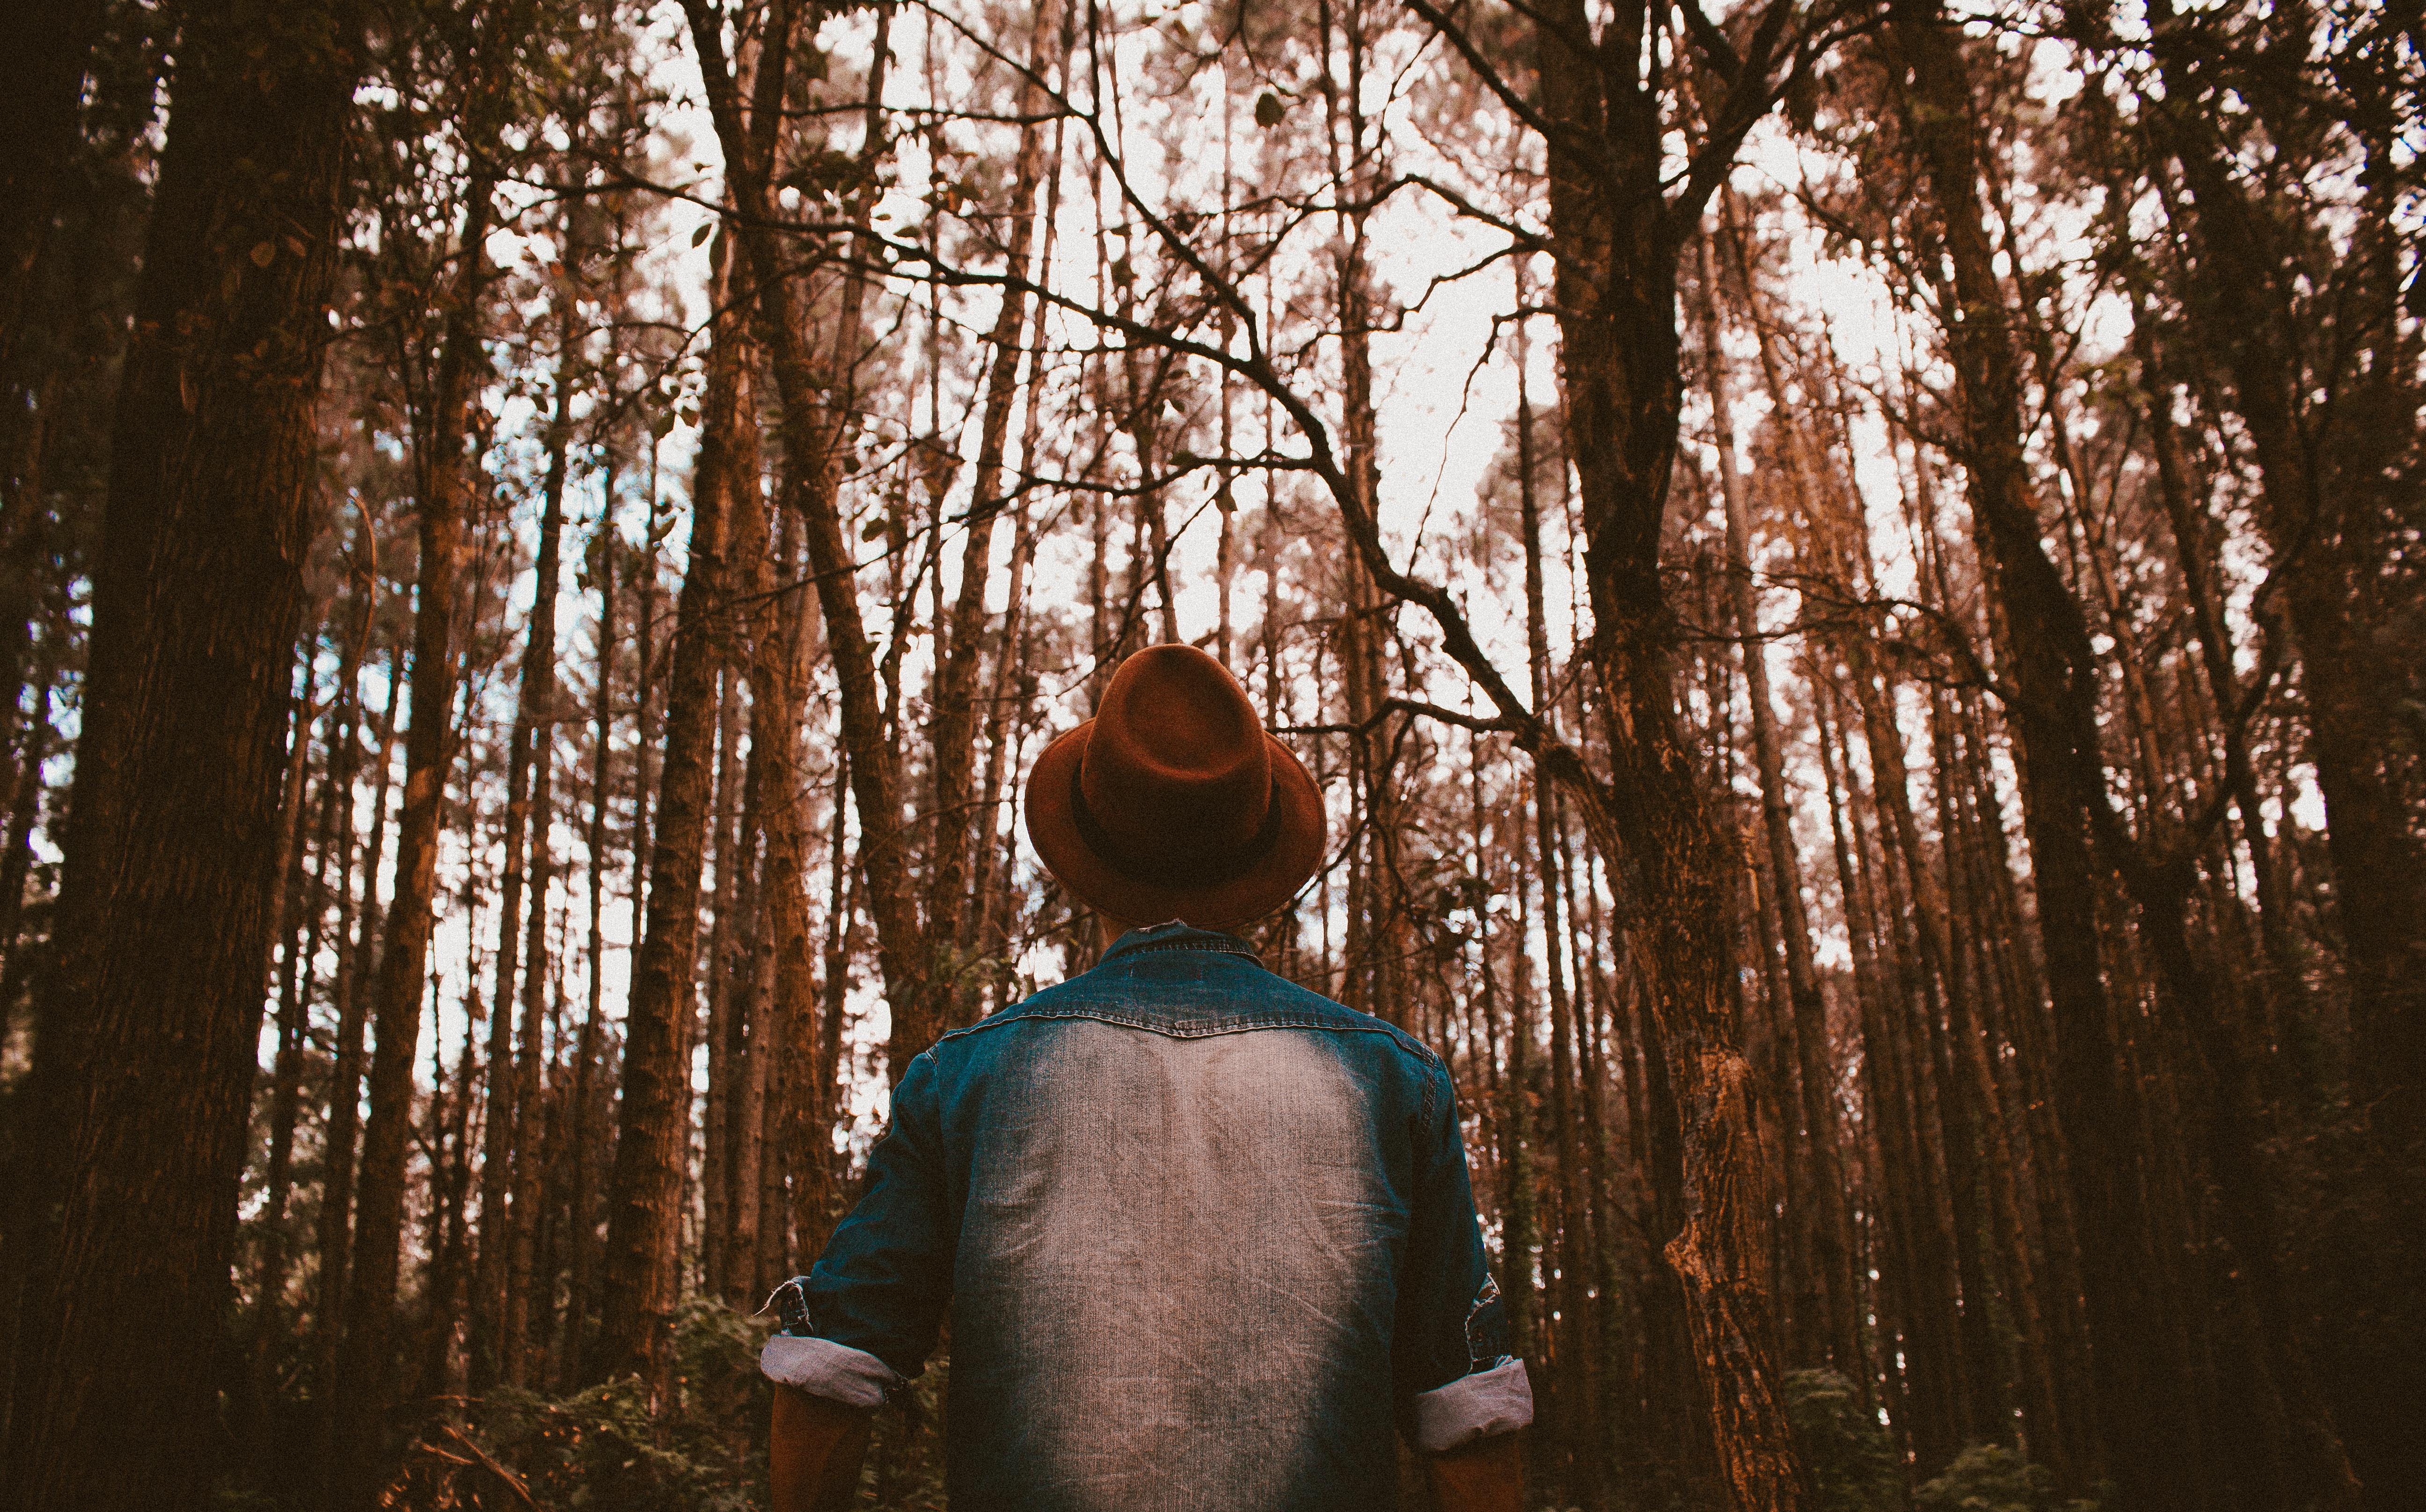 красивые картинки мужчина лес фото одна